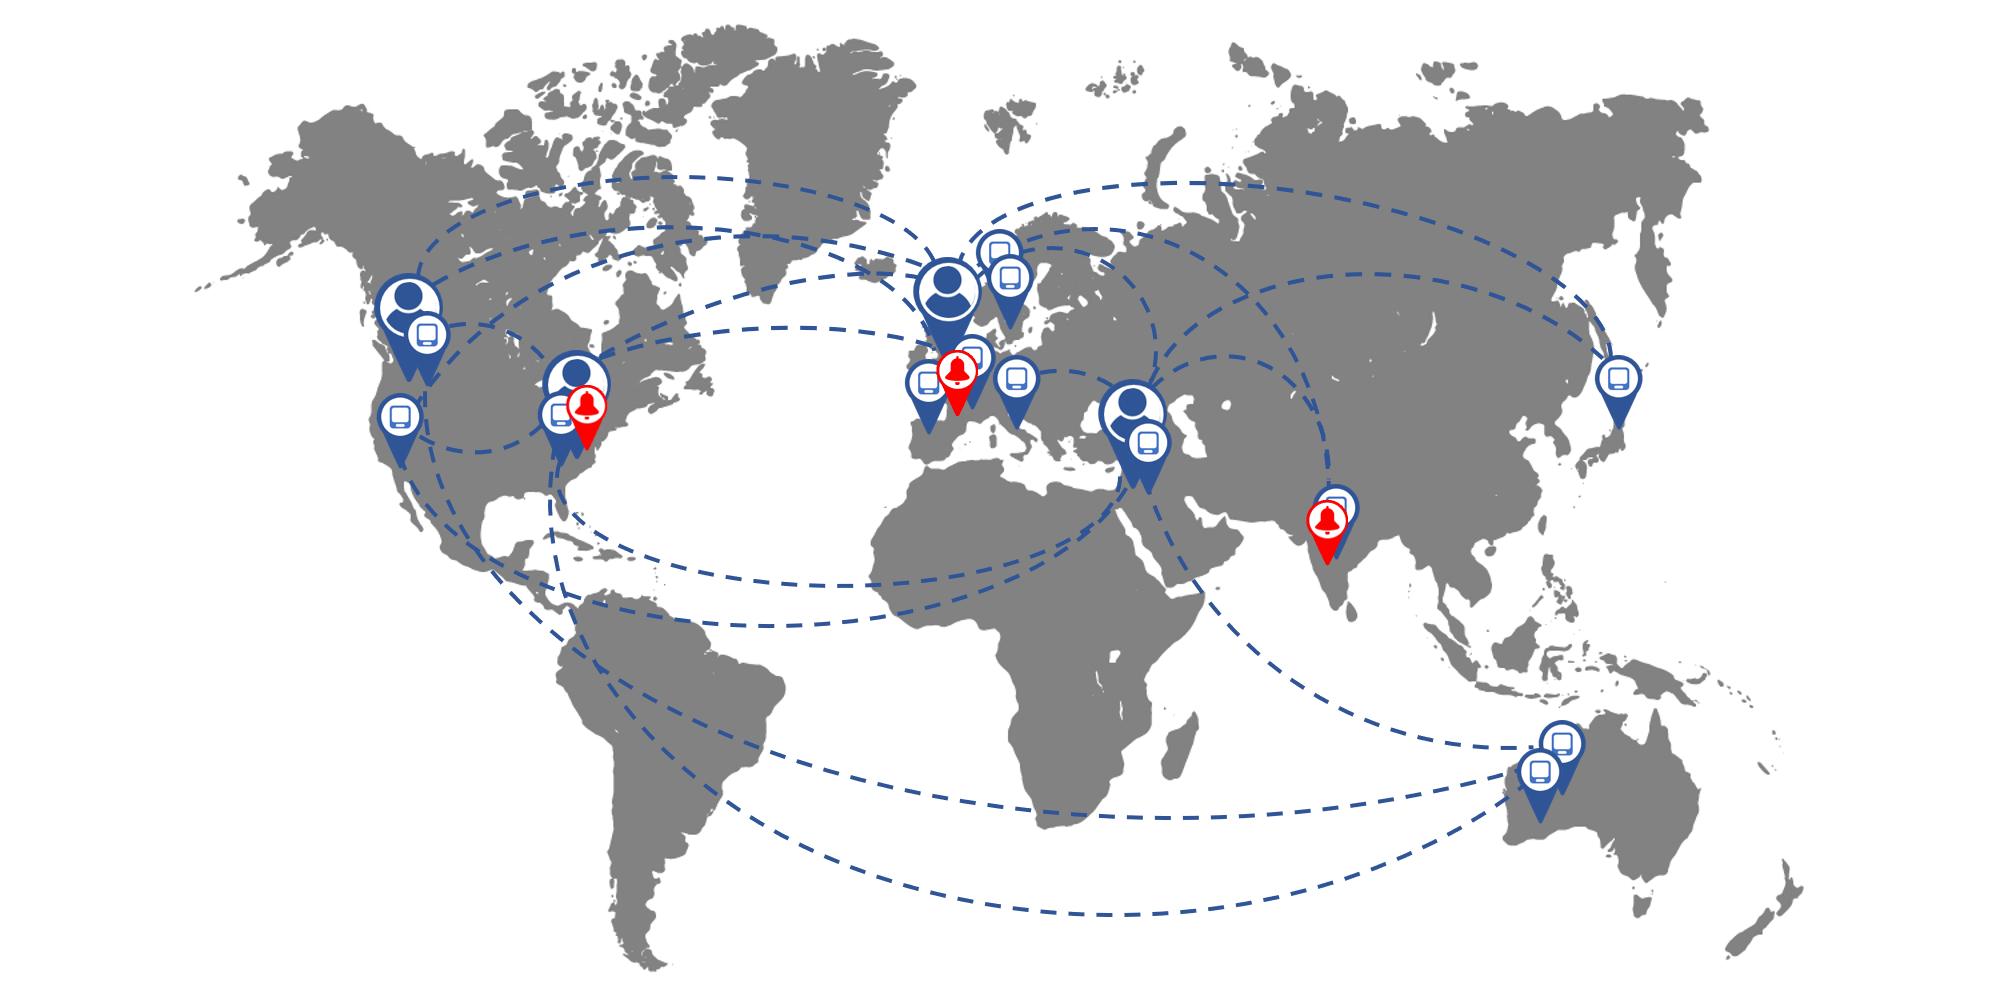 RF400 WiFi Monitoring System Global Usage